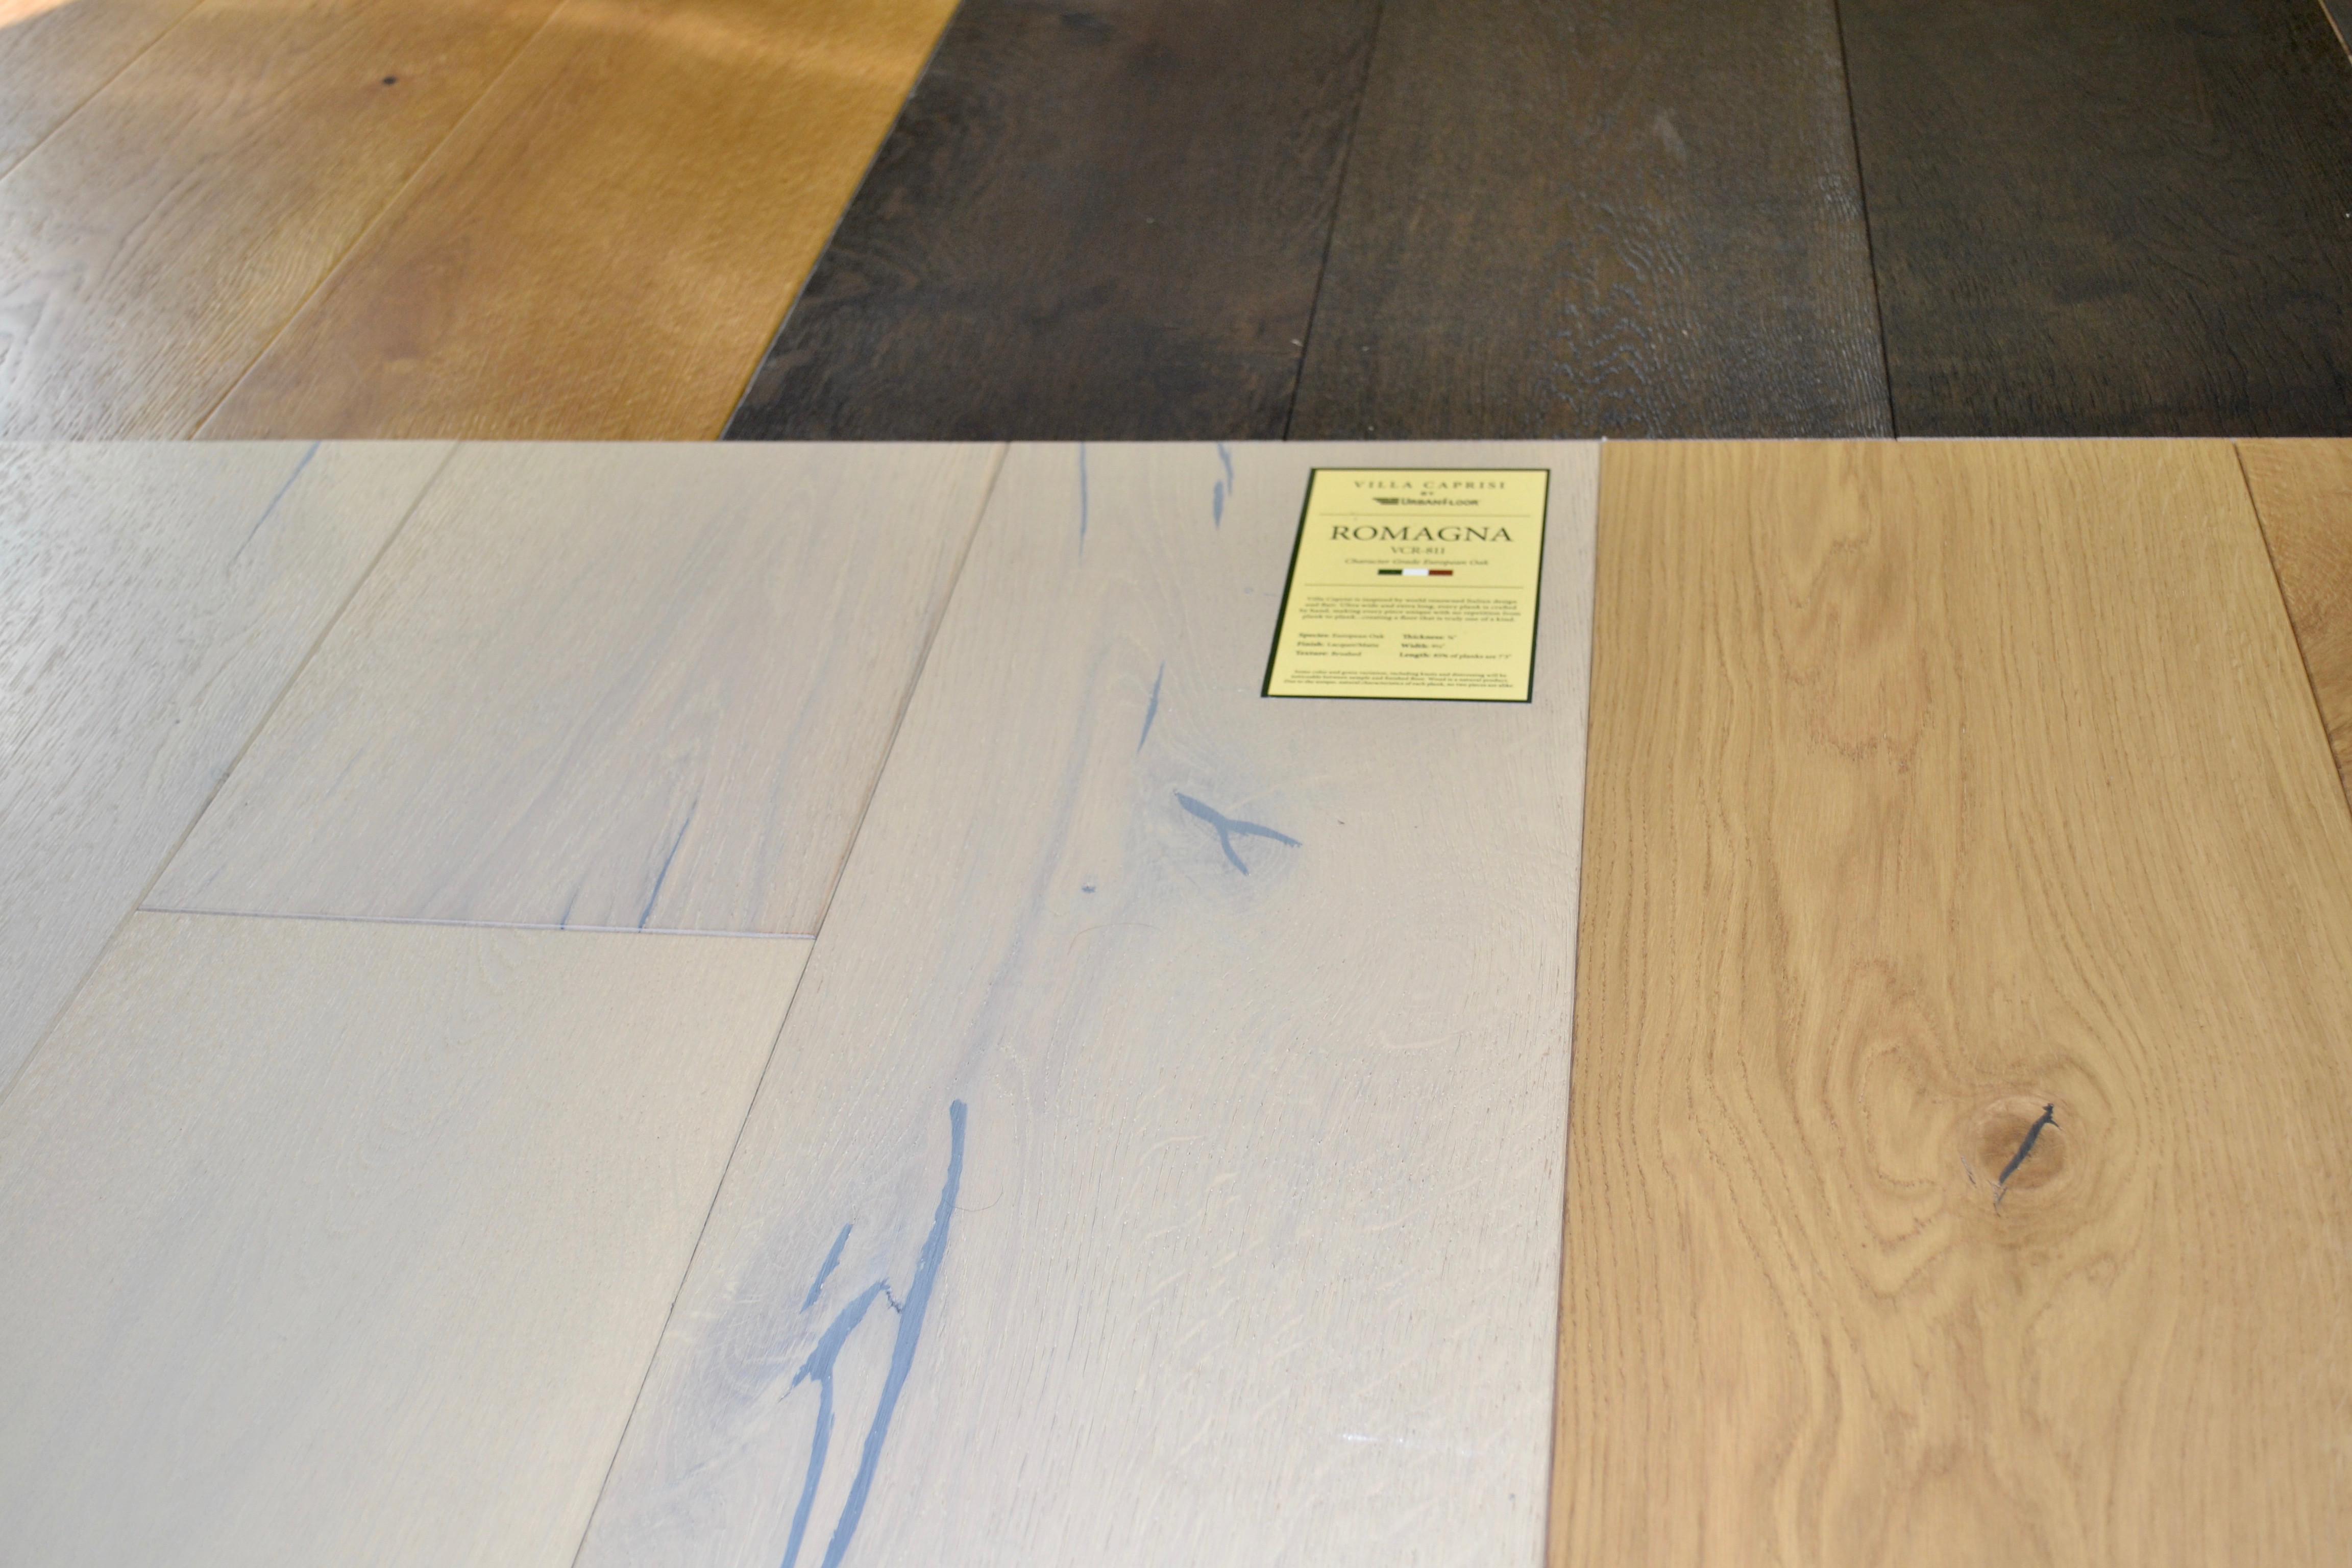 top quality engineered hardwood flooring of villa caprisi fine european hardwood millennium hardwood within villa caprisi fine european hardwood millennium hardwood flooring millennium hardwood flooring